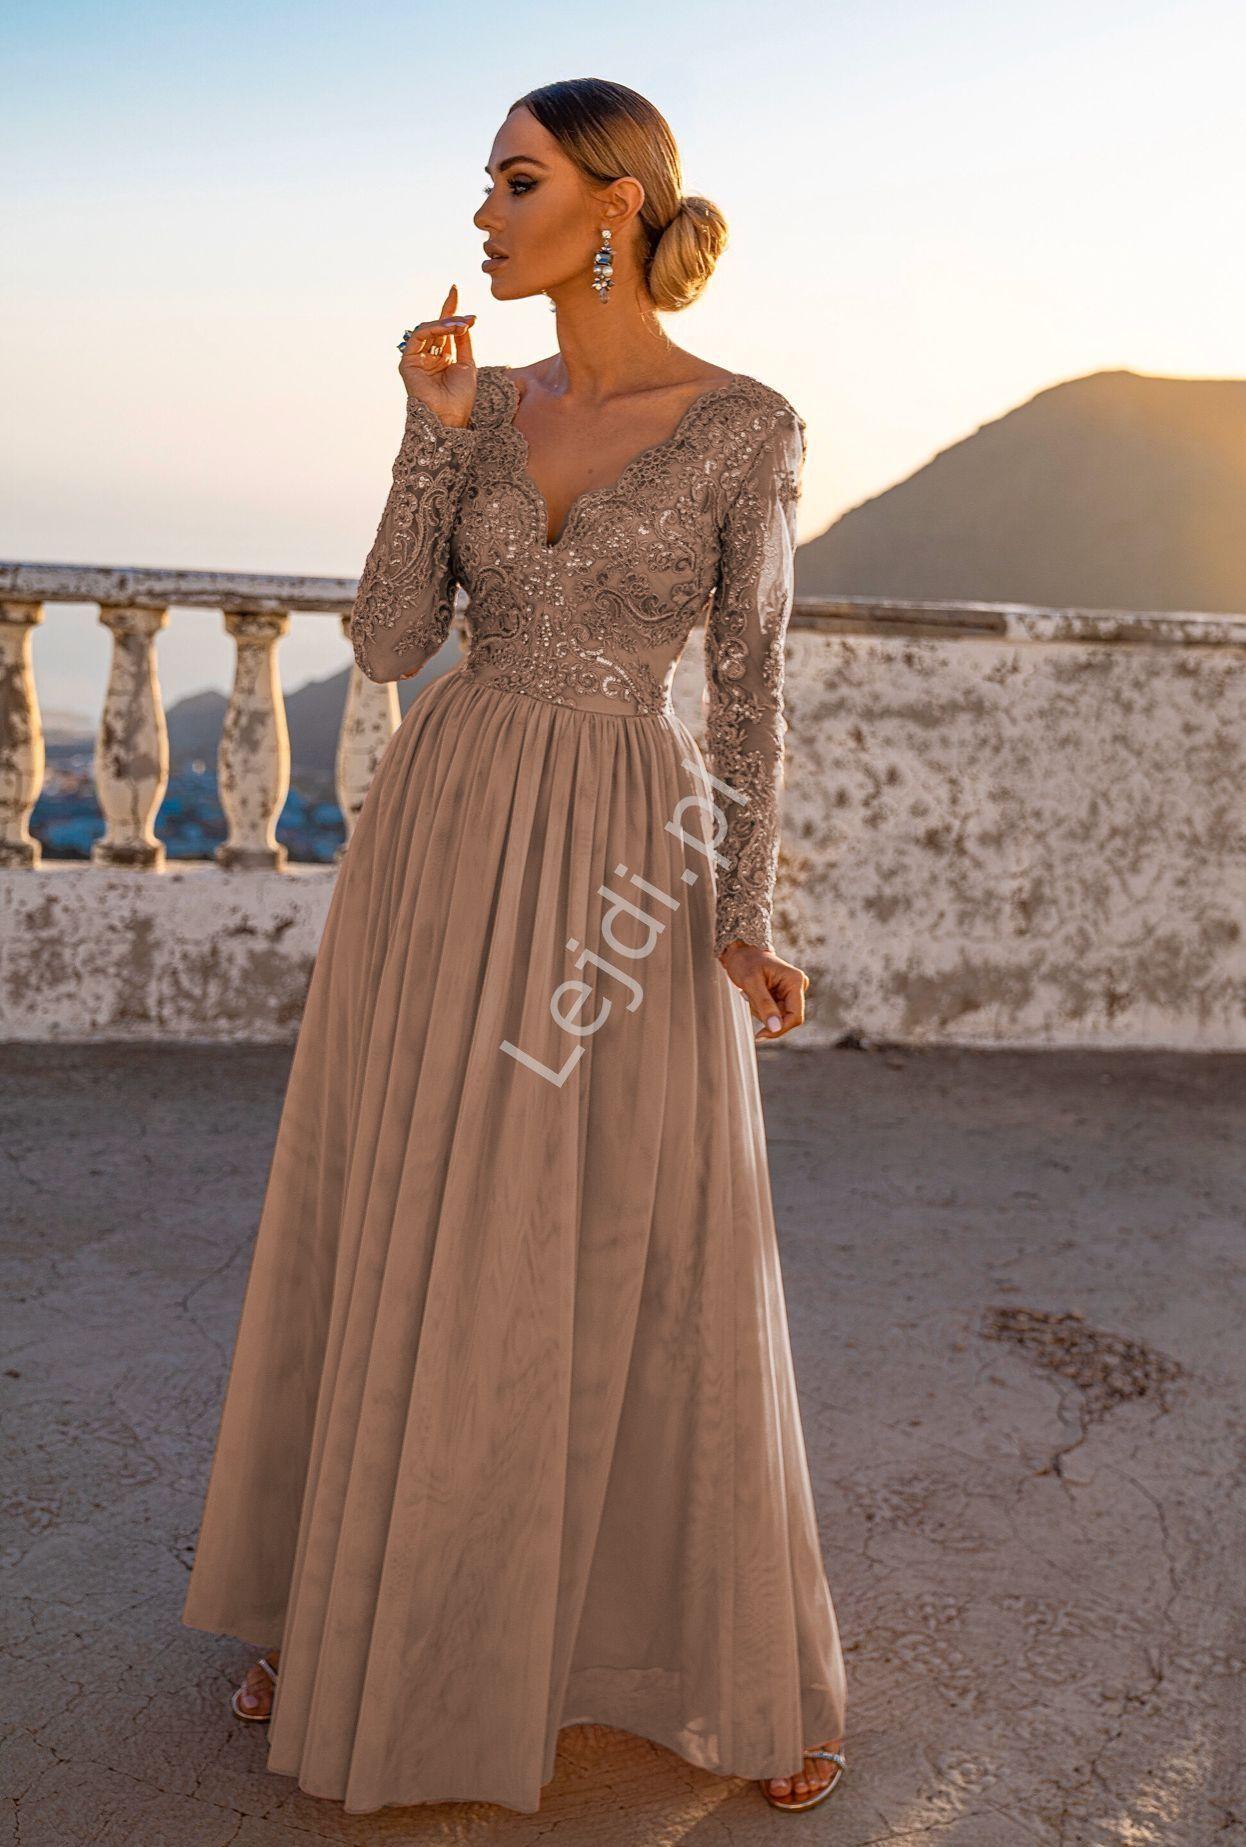 Dluga Tiulowa Sukienka Dla Druhny Na Studniowke Na Wesele Adel Kawa Z Mlekiem Outfits Fashion Dresses With Sleeves